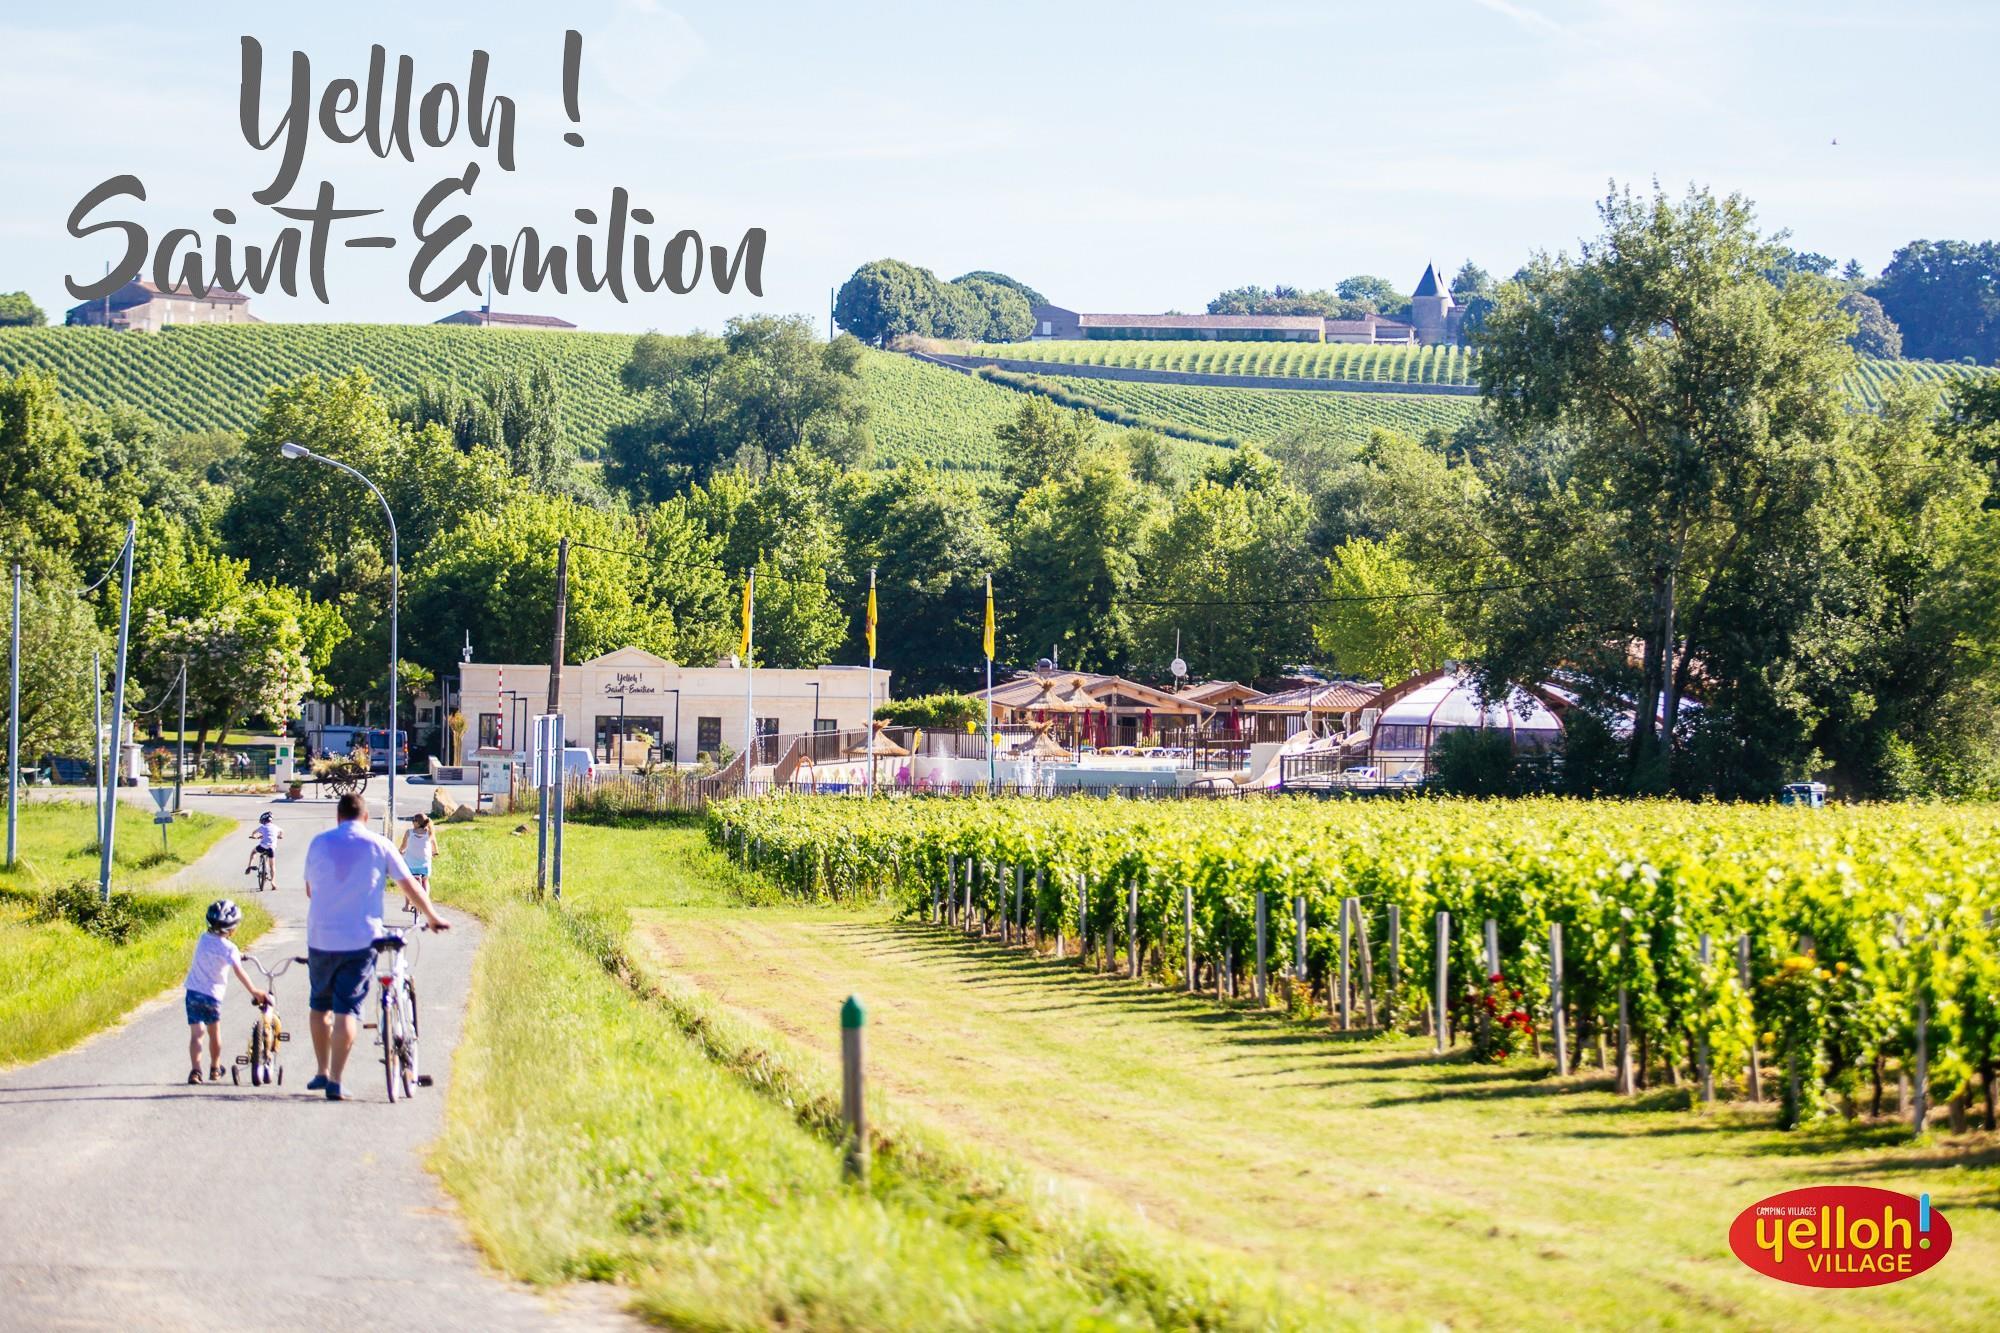 Camping Yelloh! Village Saint-Emilion, Saint-Emilion, Gironde